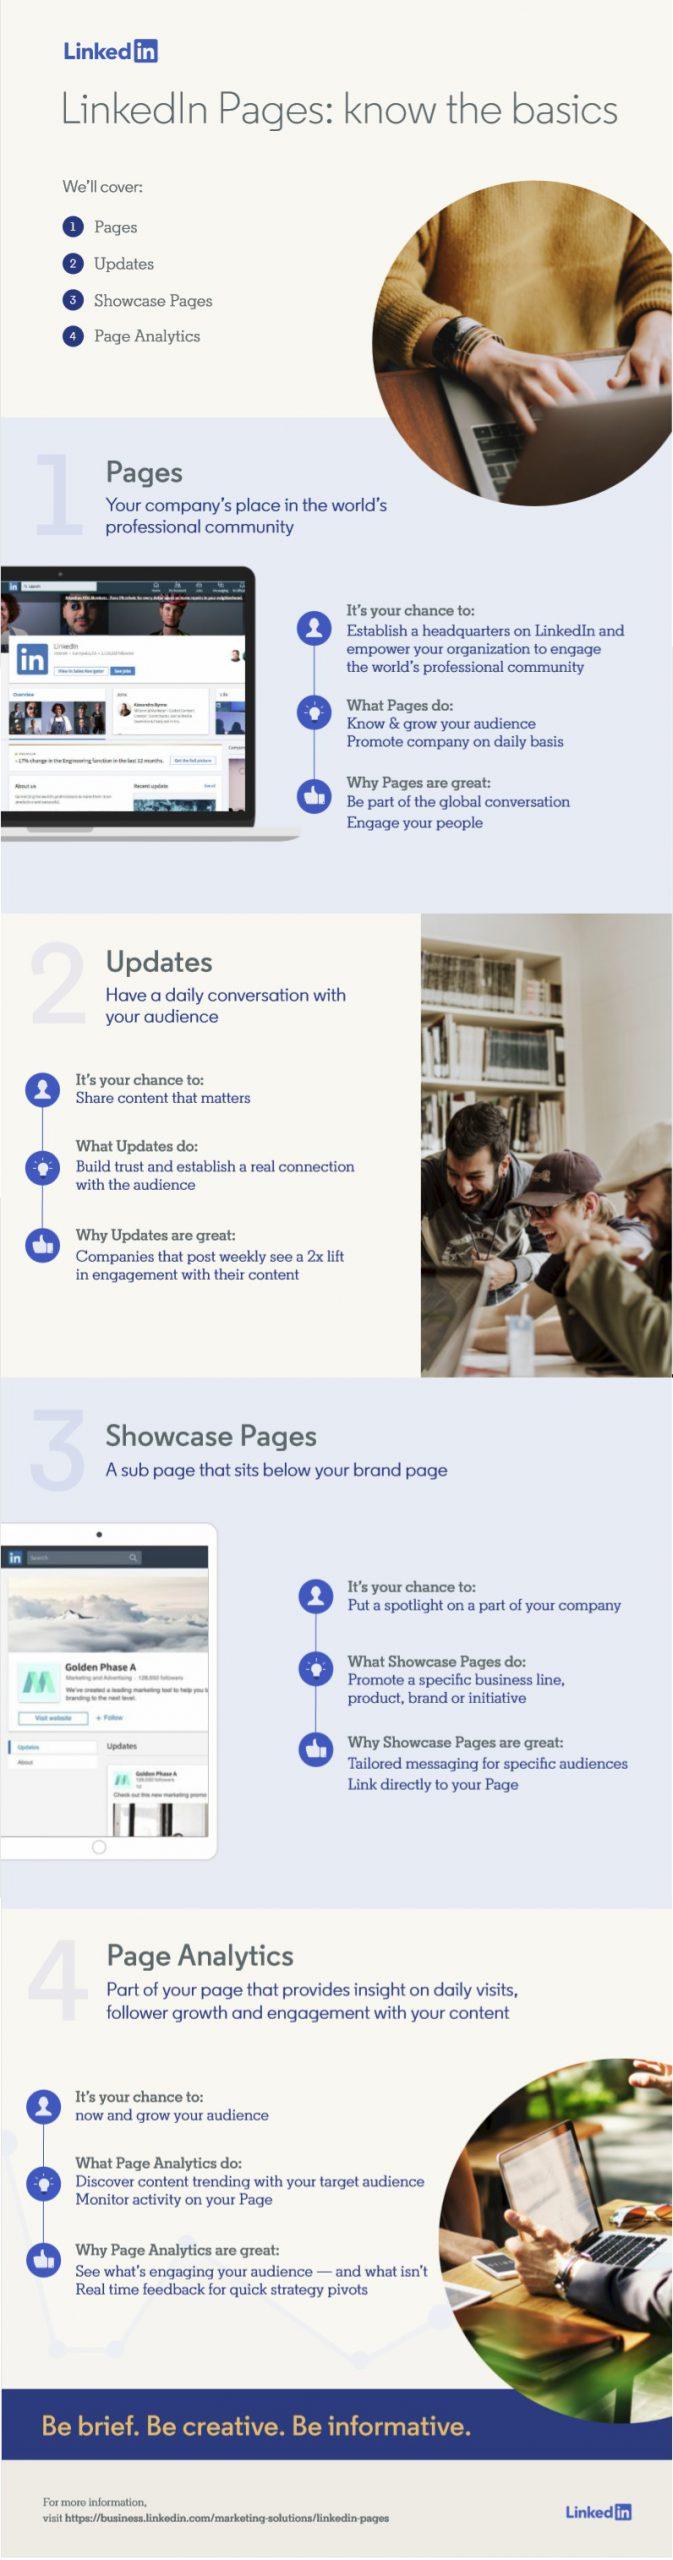 Linkedin bedrijfspagina tips